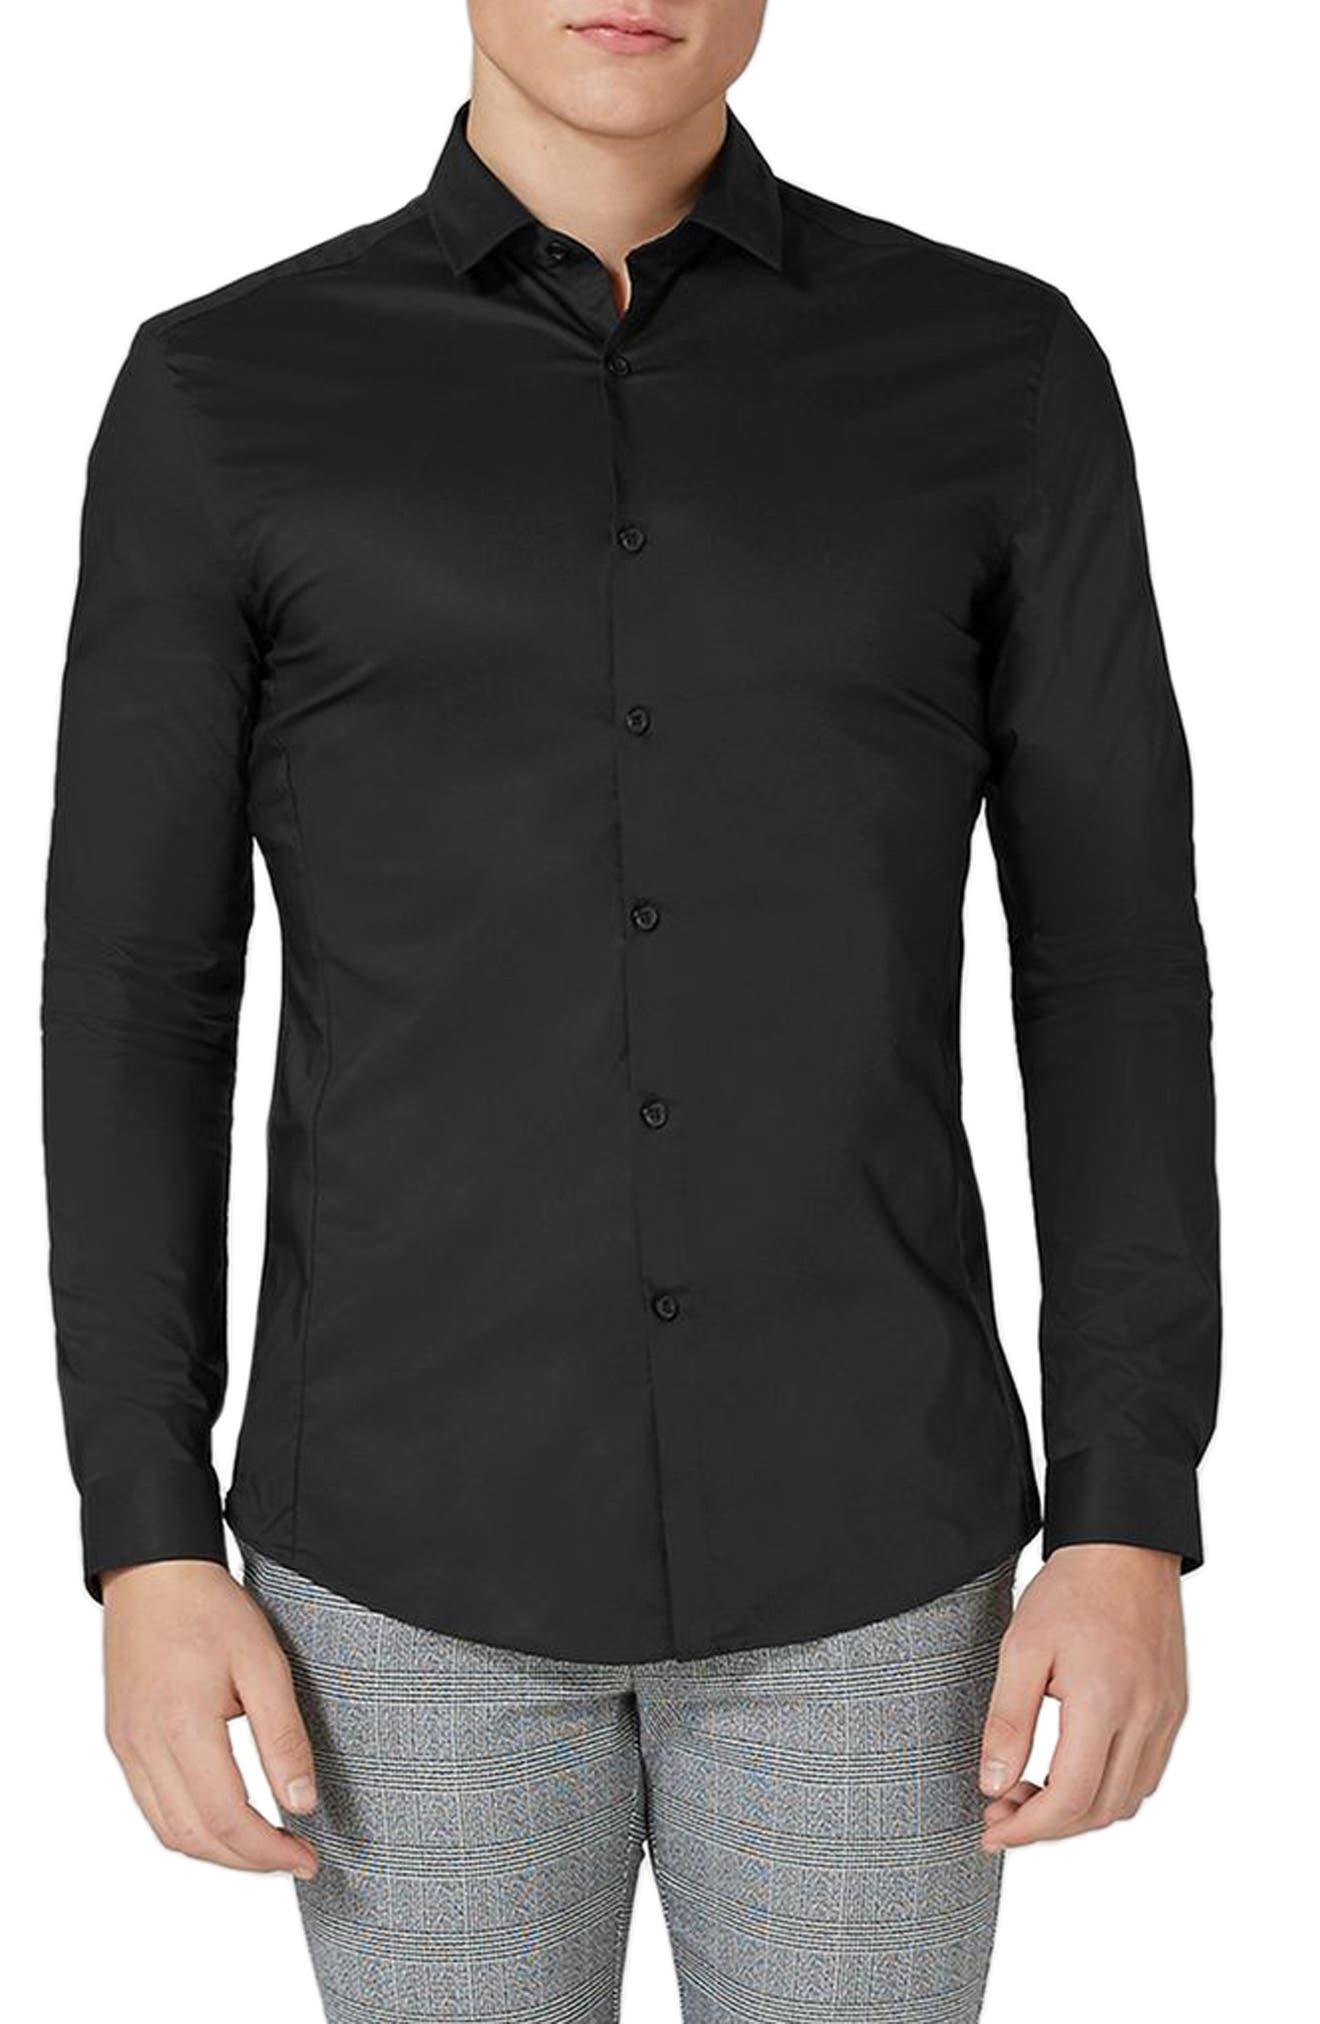 TOPMAN, Muscle Fit Stretch Poplin Shirt, Main thumbnail 1, color, BLACK